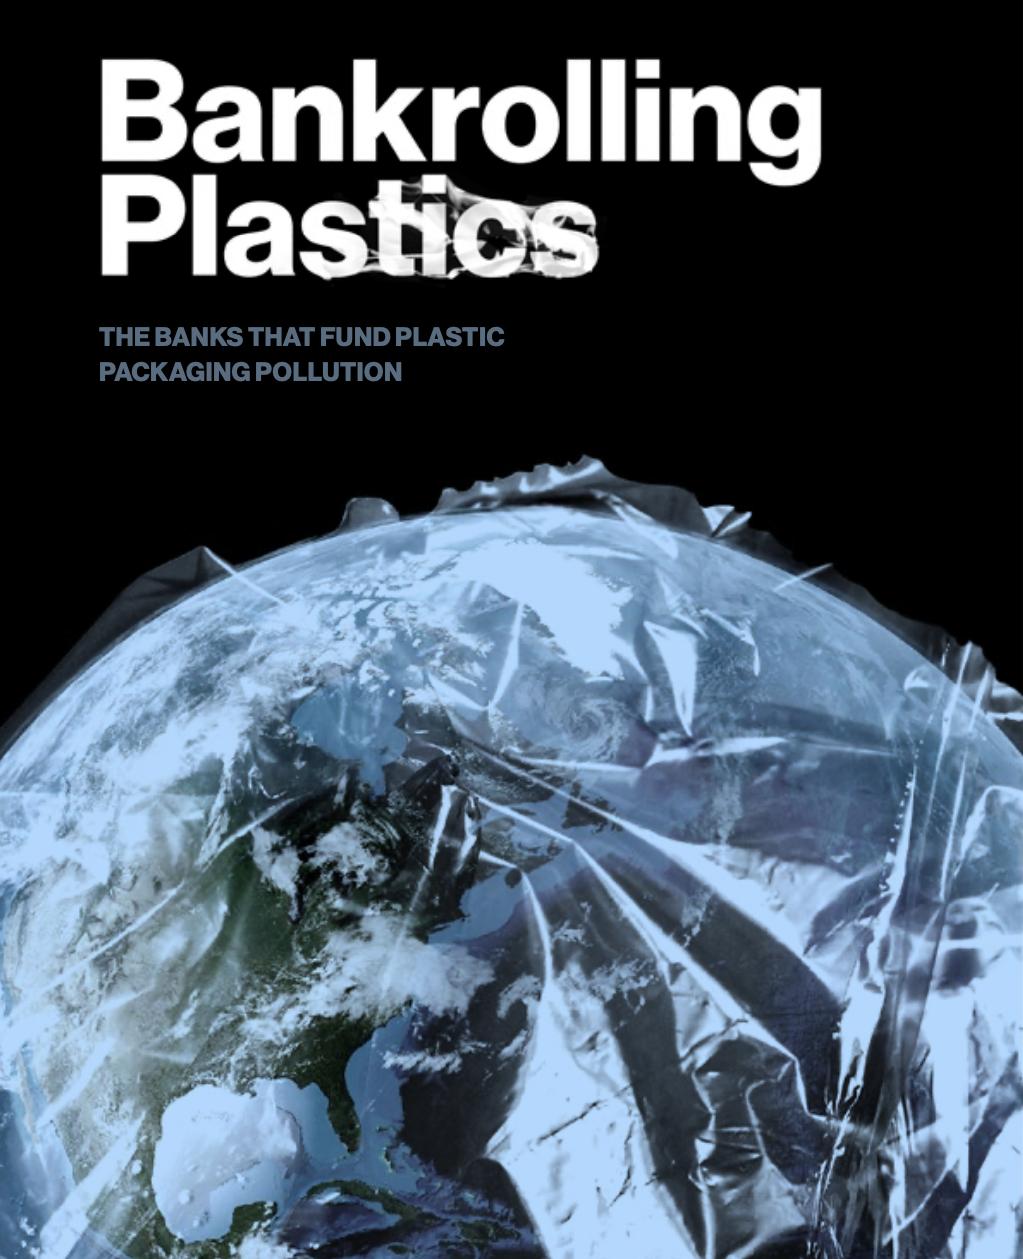 Major banks are funding plastics pollution, finds new report - bioplastics MAGAZINE